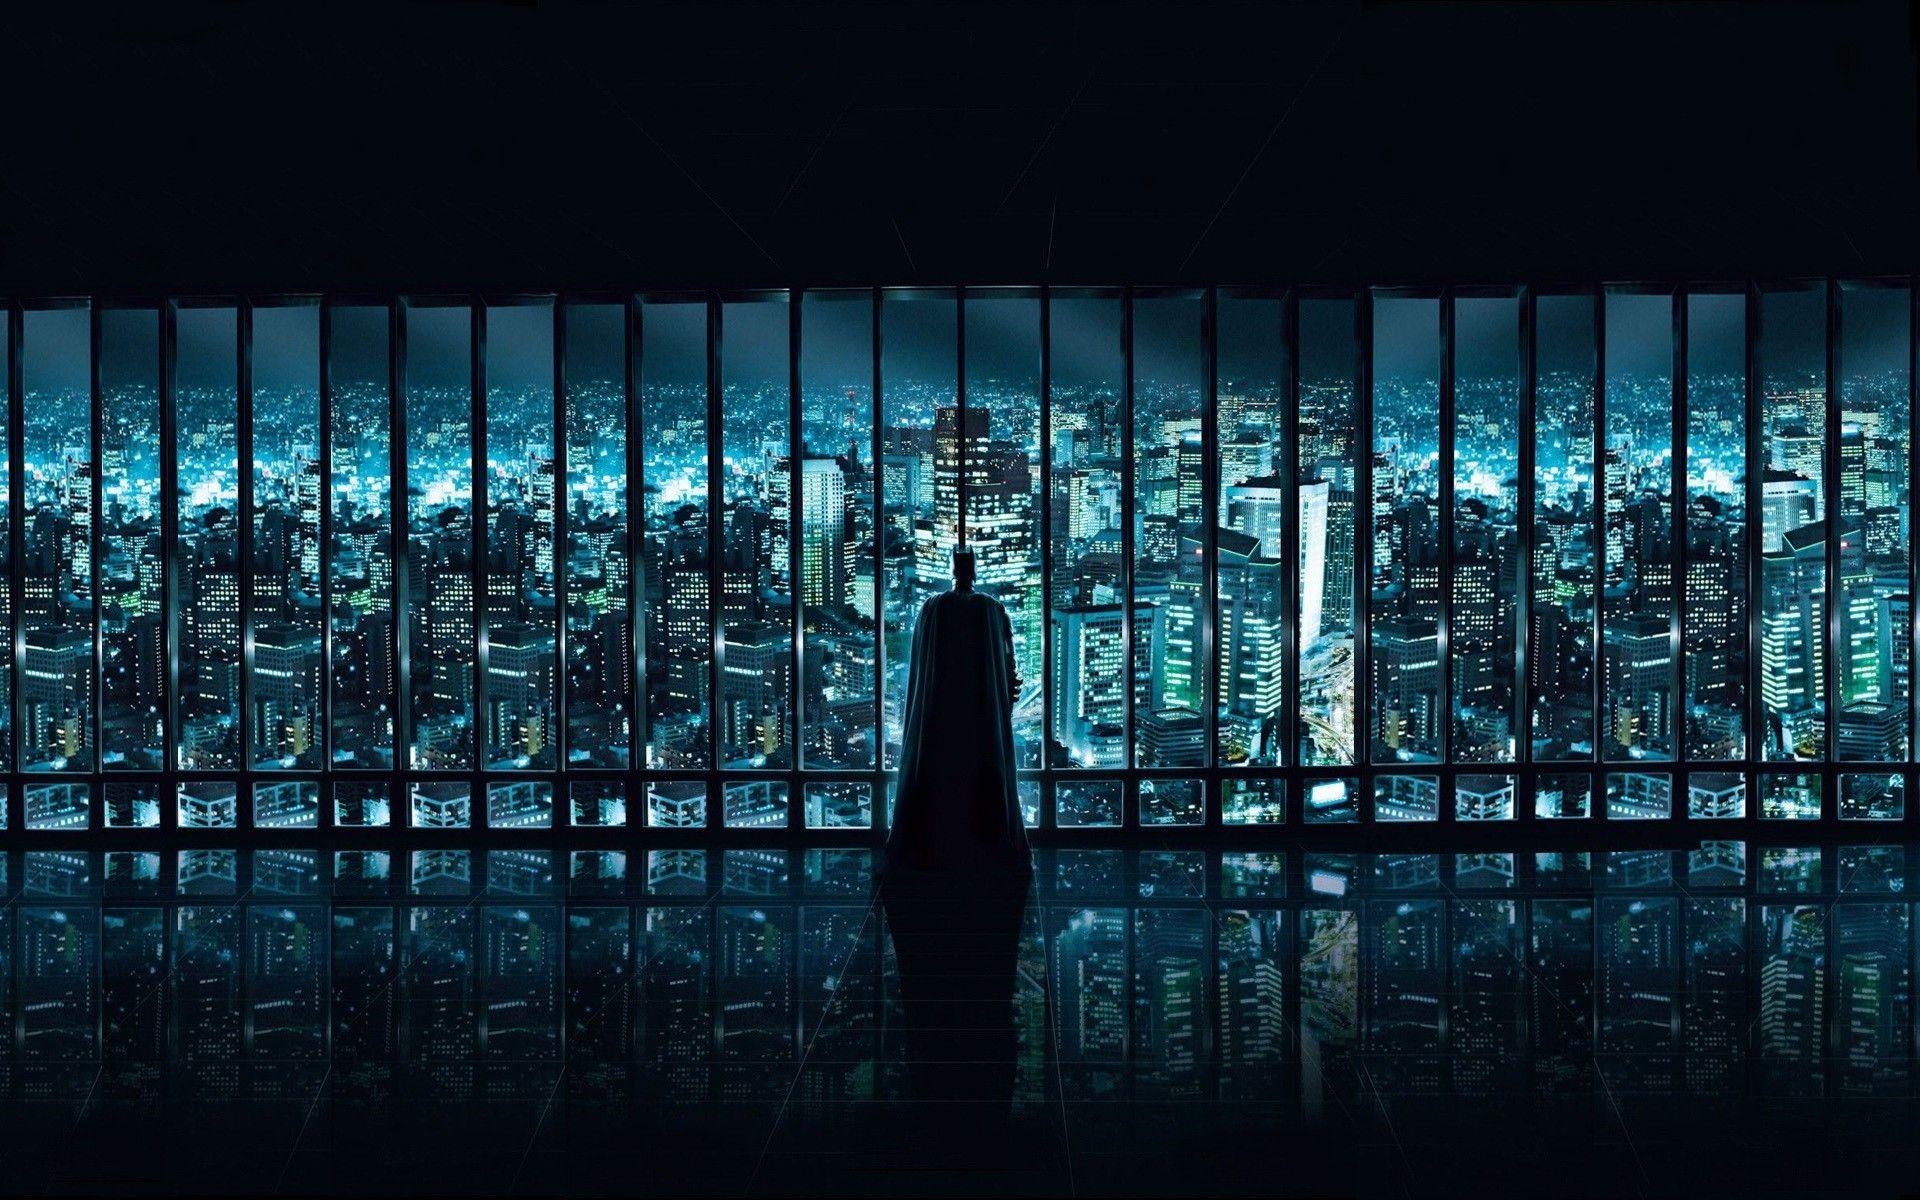 batman background images, batman wallpapers